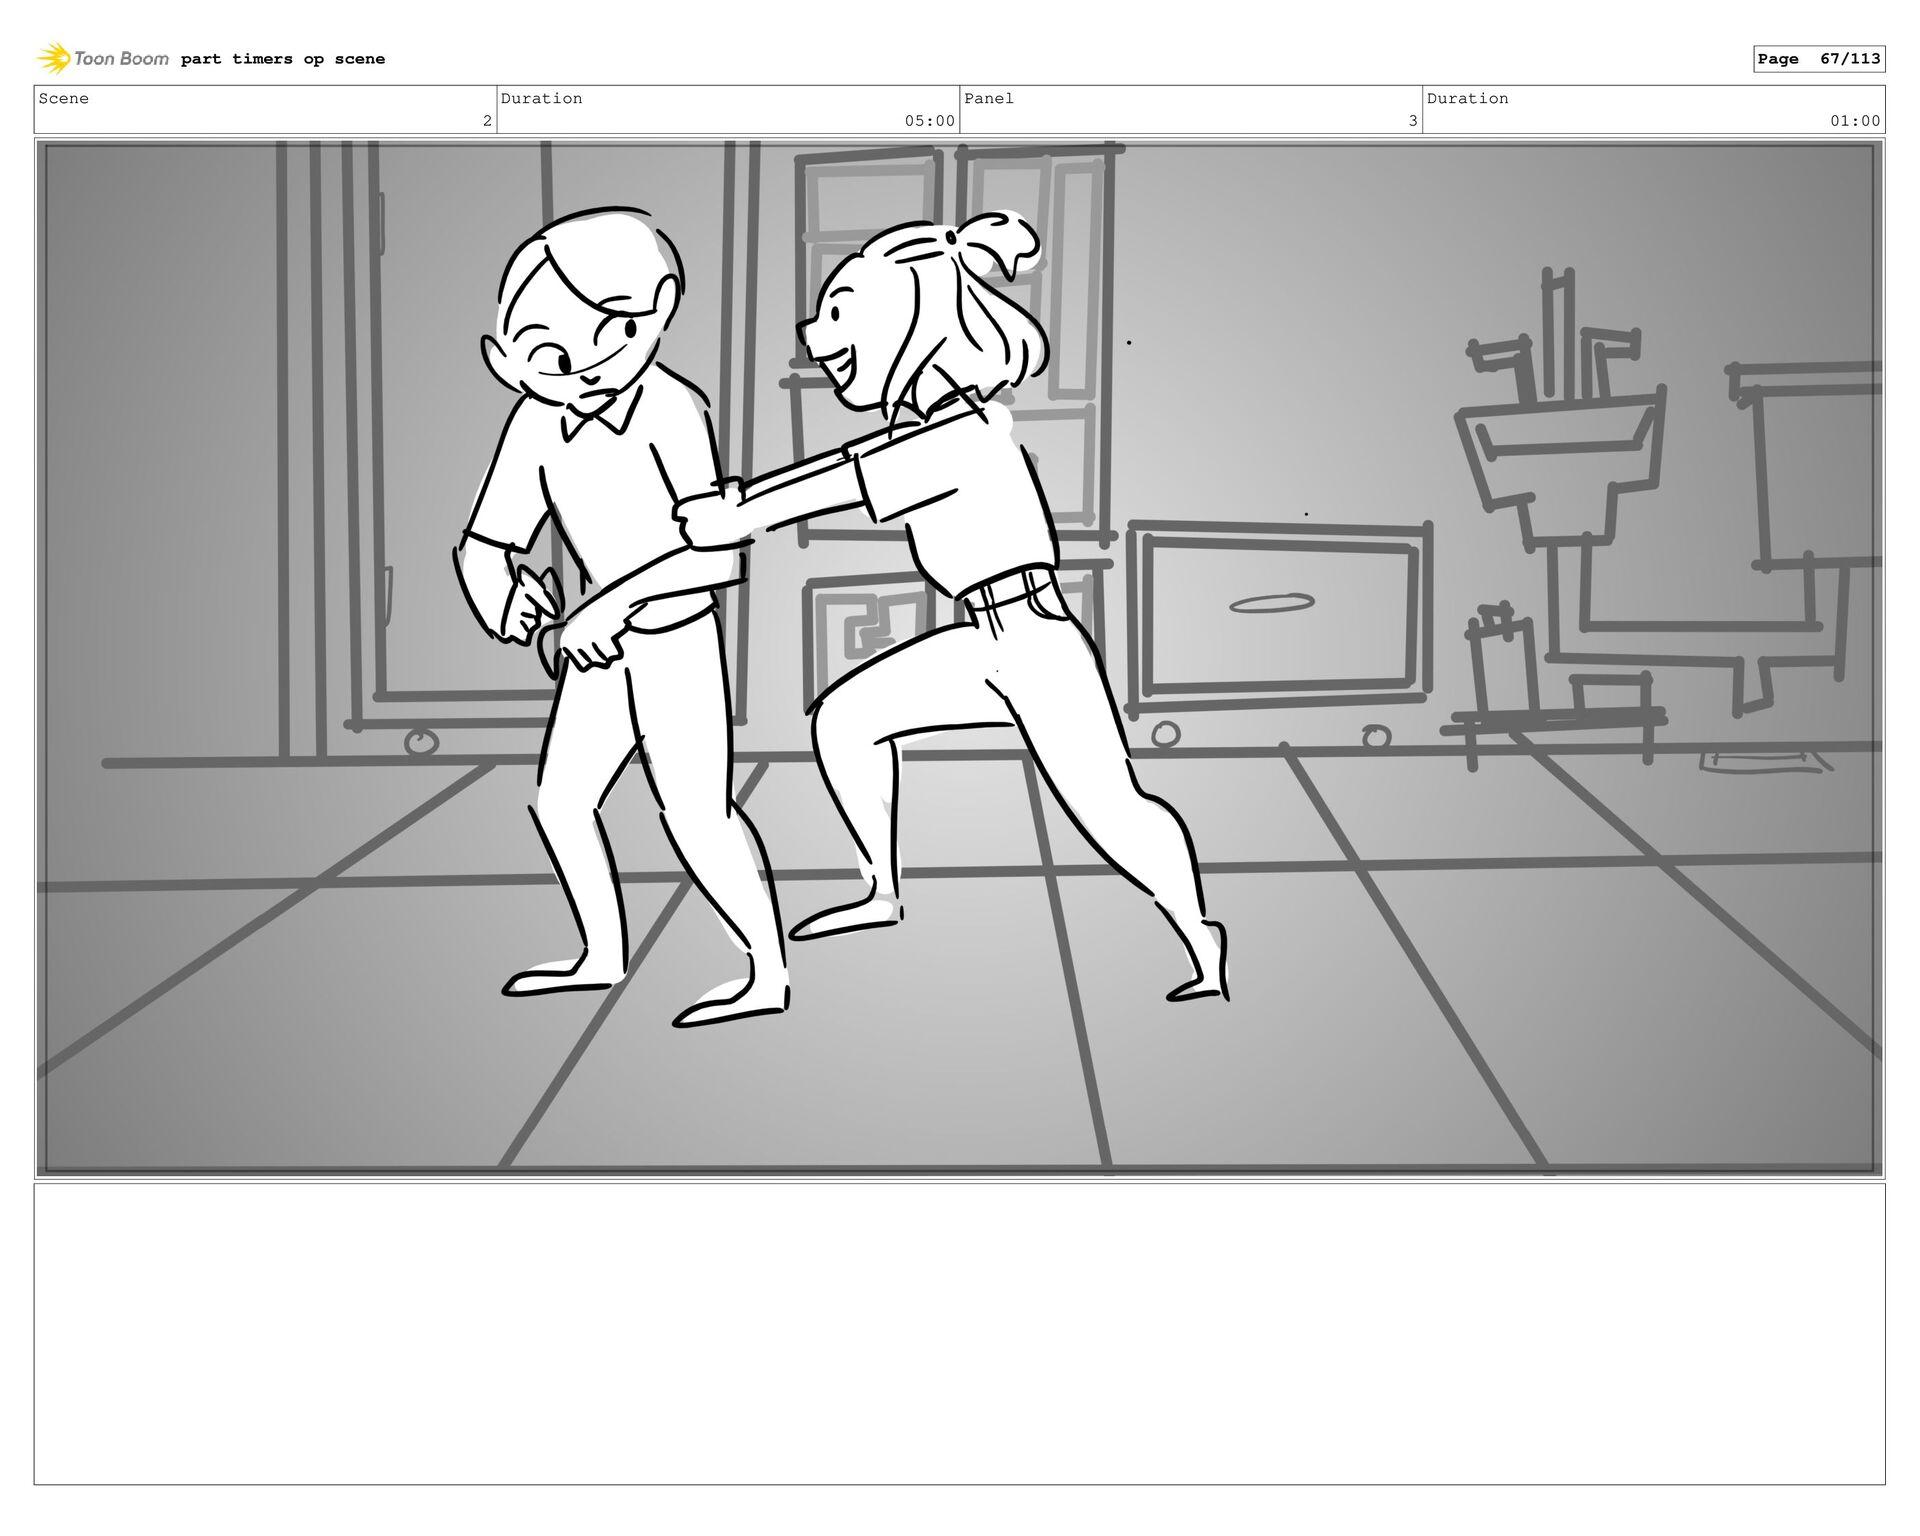 Scene 3 Duration 44:00 Panel 35 Duration 01:00 ...